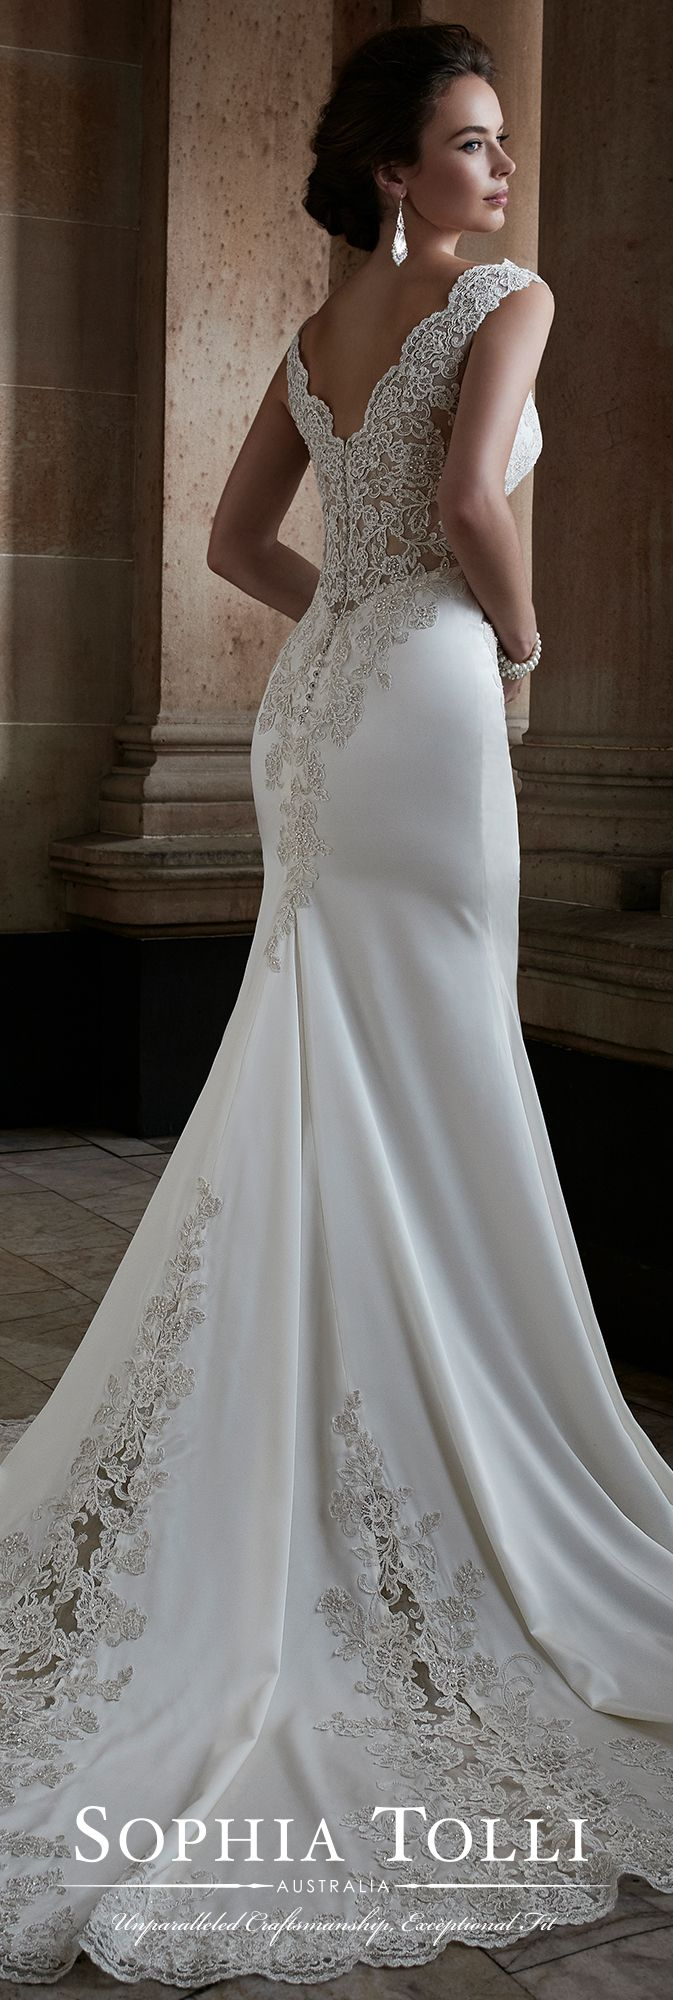 Lace and Satin Wedding Dress